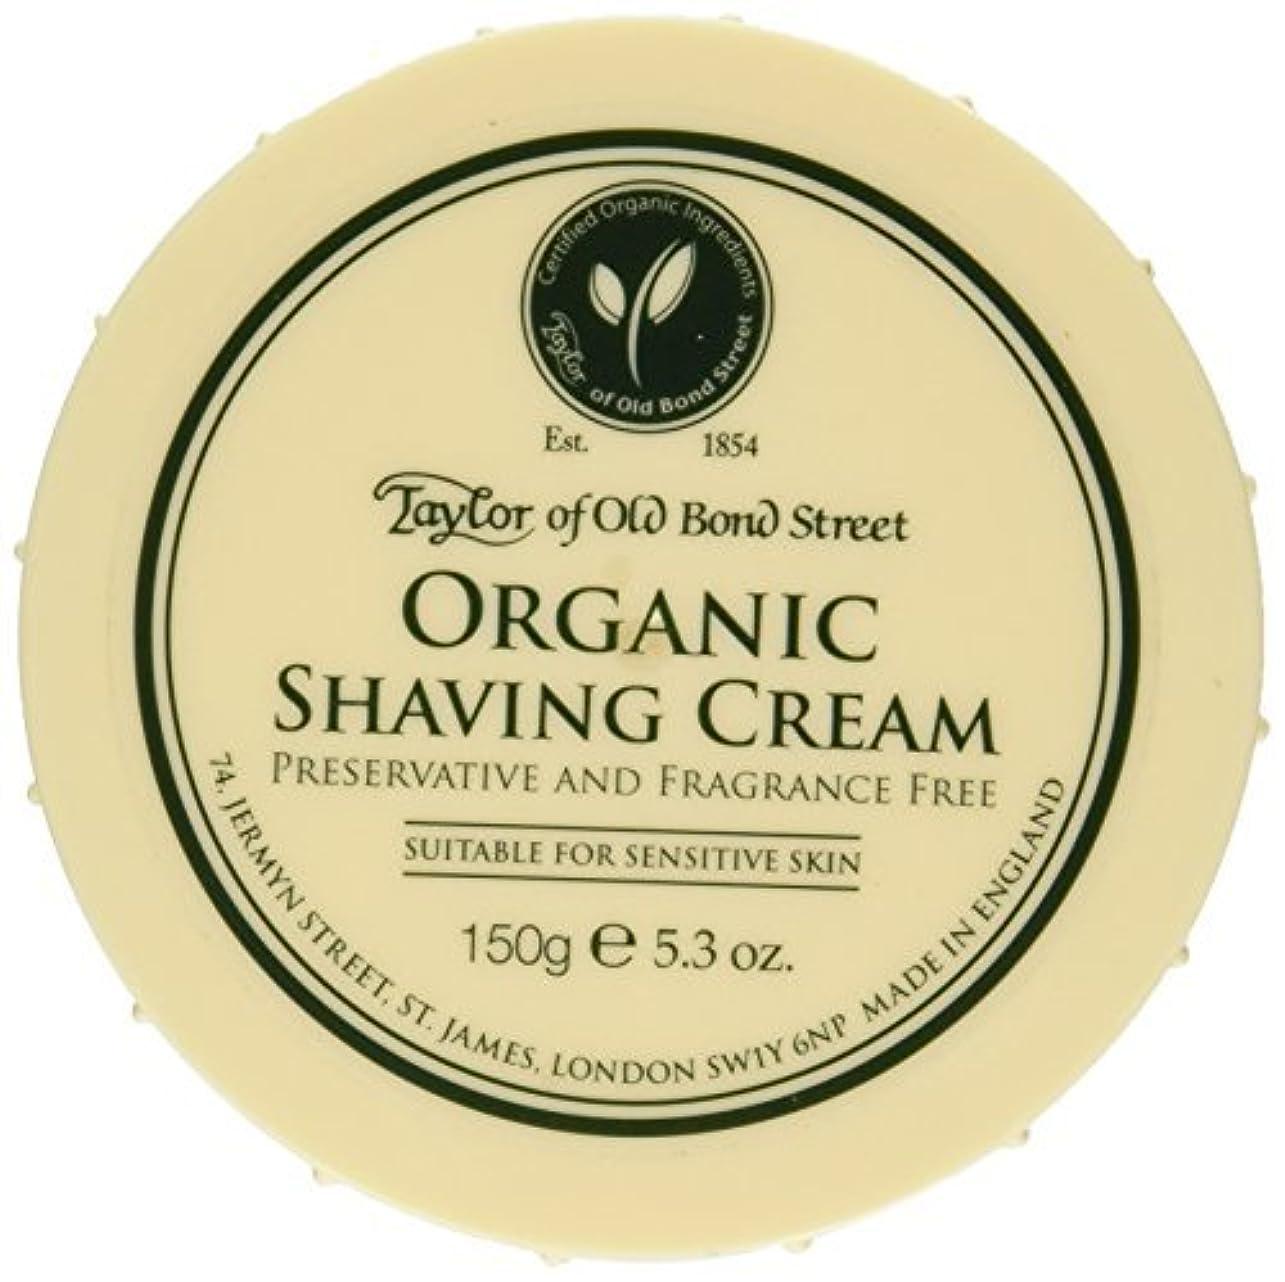 Taylor of Old Bond Street Organic Shaving Cream Bowl 150 g by Taylor of Old Bond Street [並行輸入品]